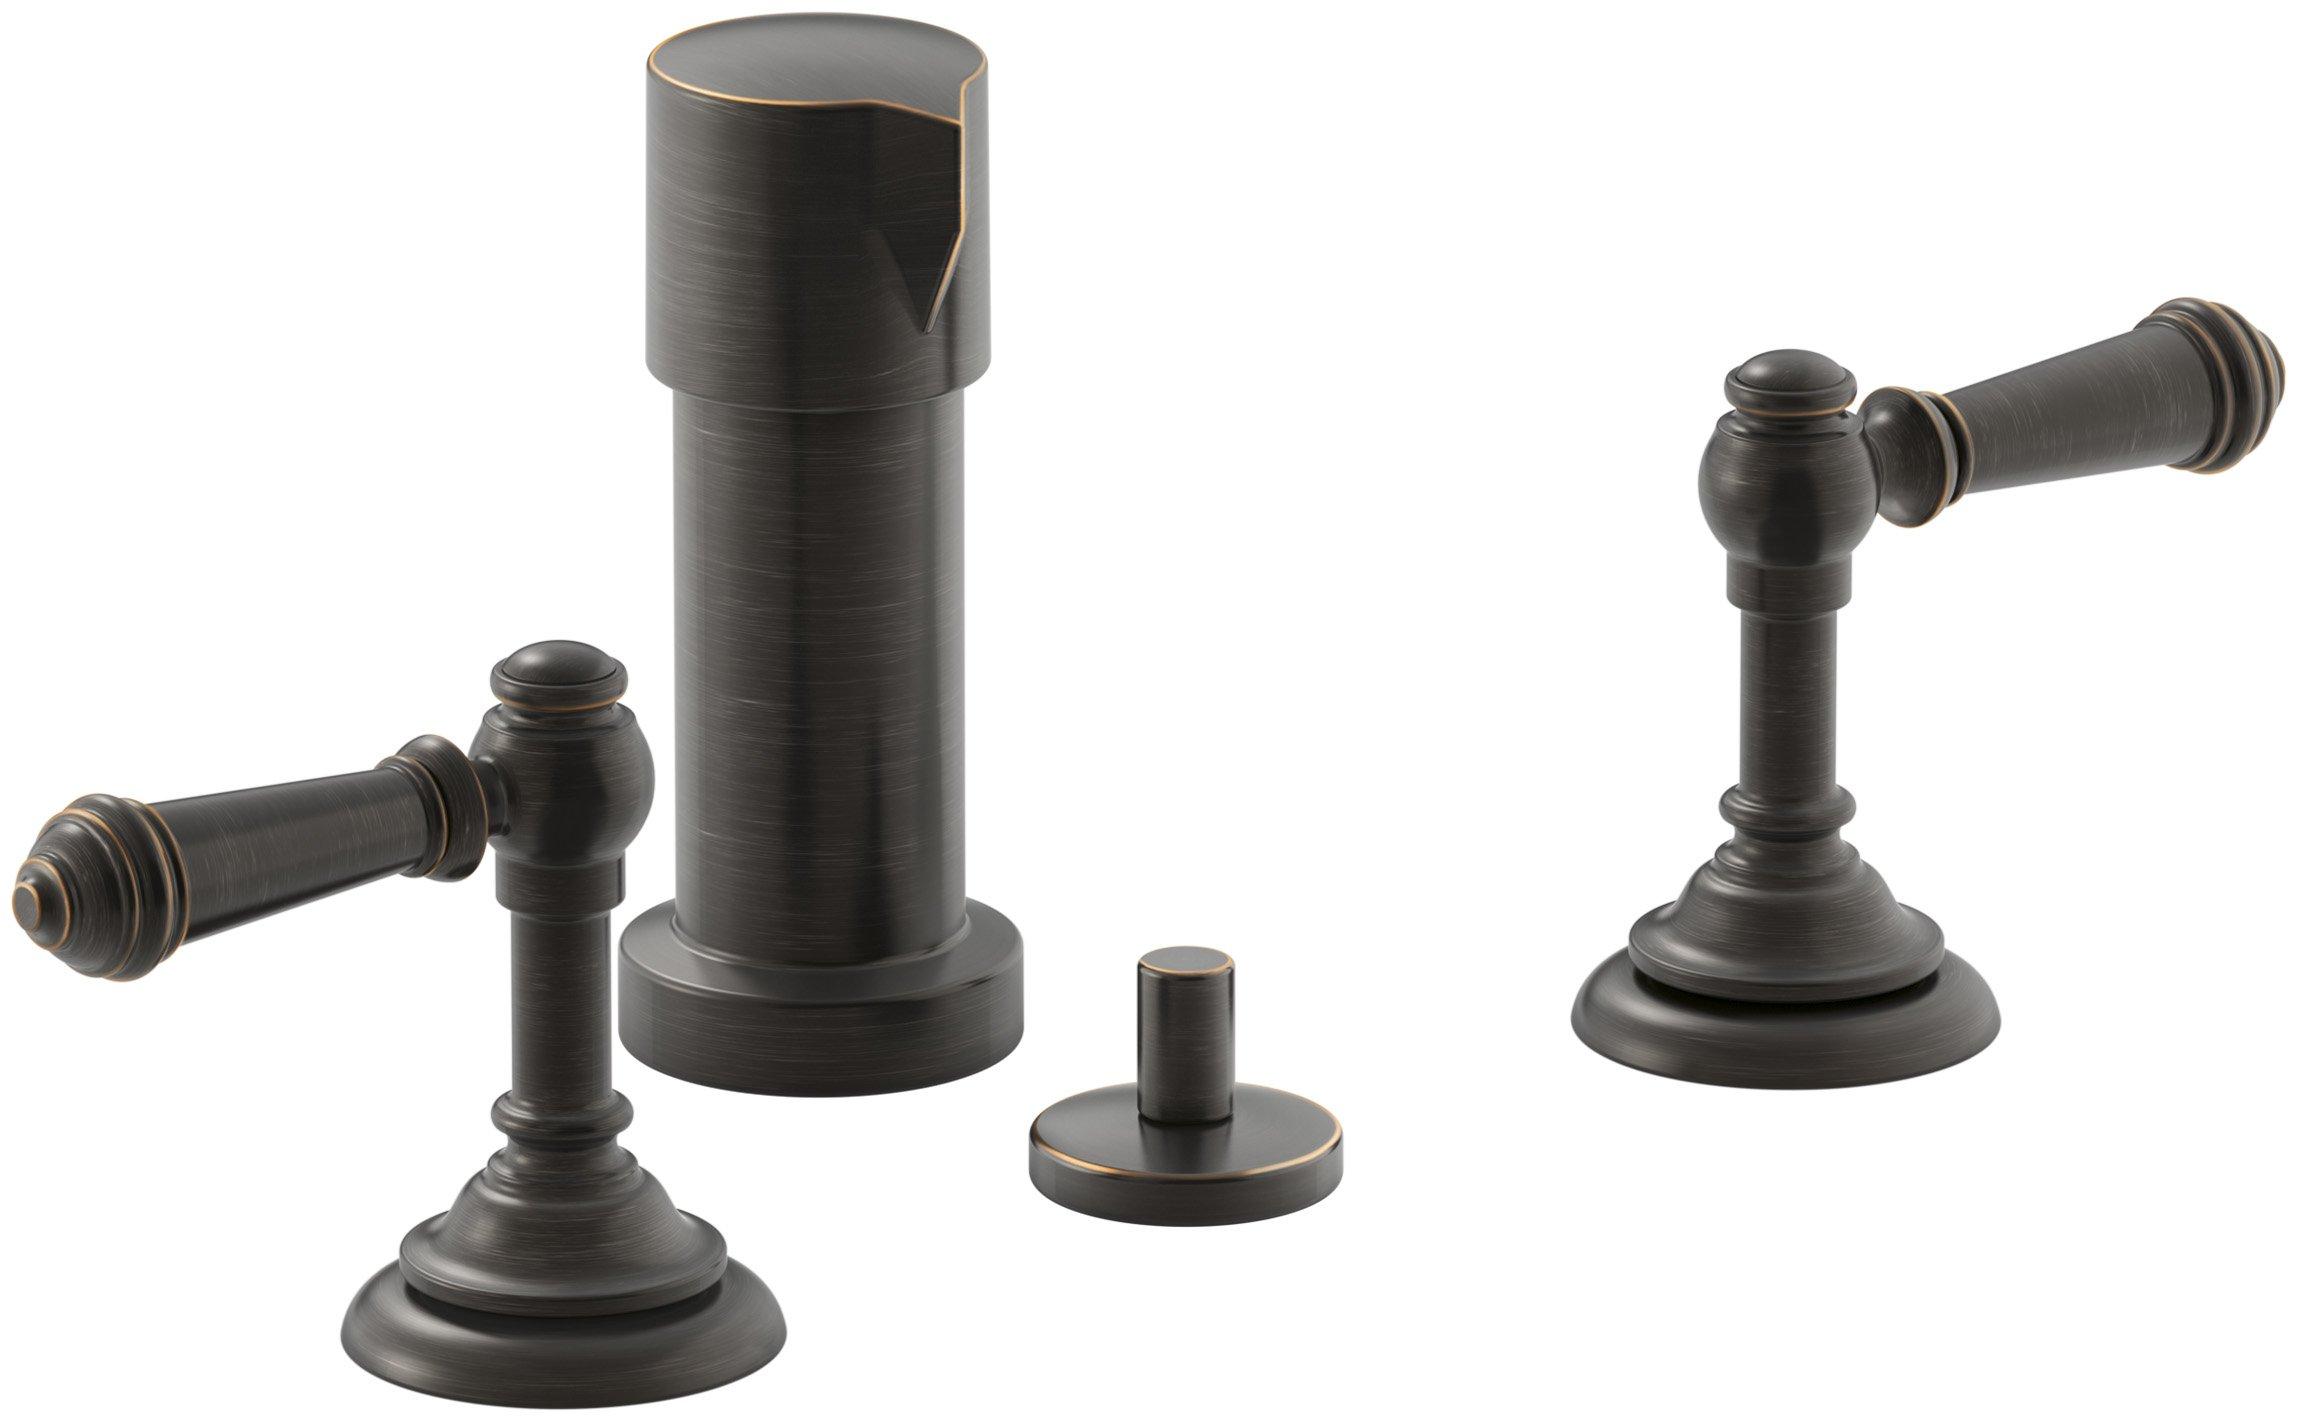 KOHLER K-72765-4-2BZ Artifacts Widespread bidet faucet with lever handles, Oil-Rubbed Bronze